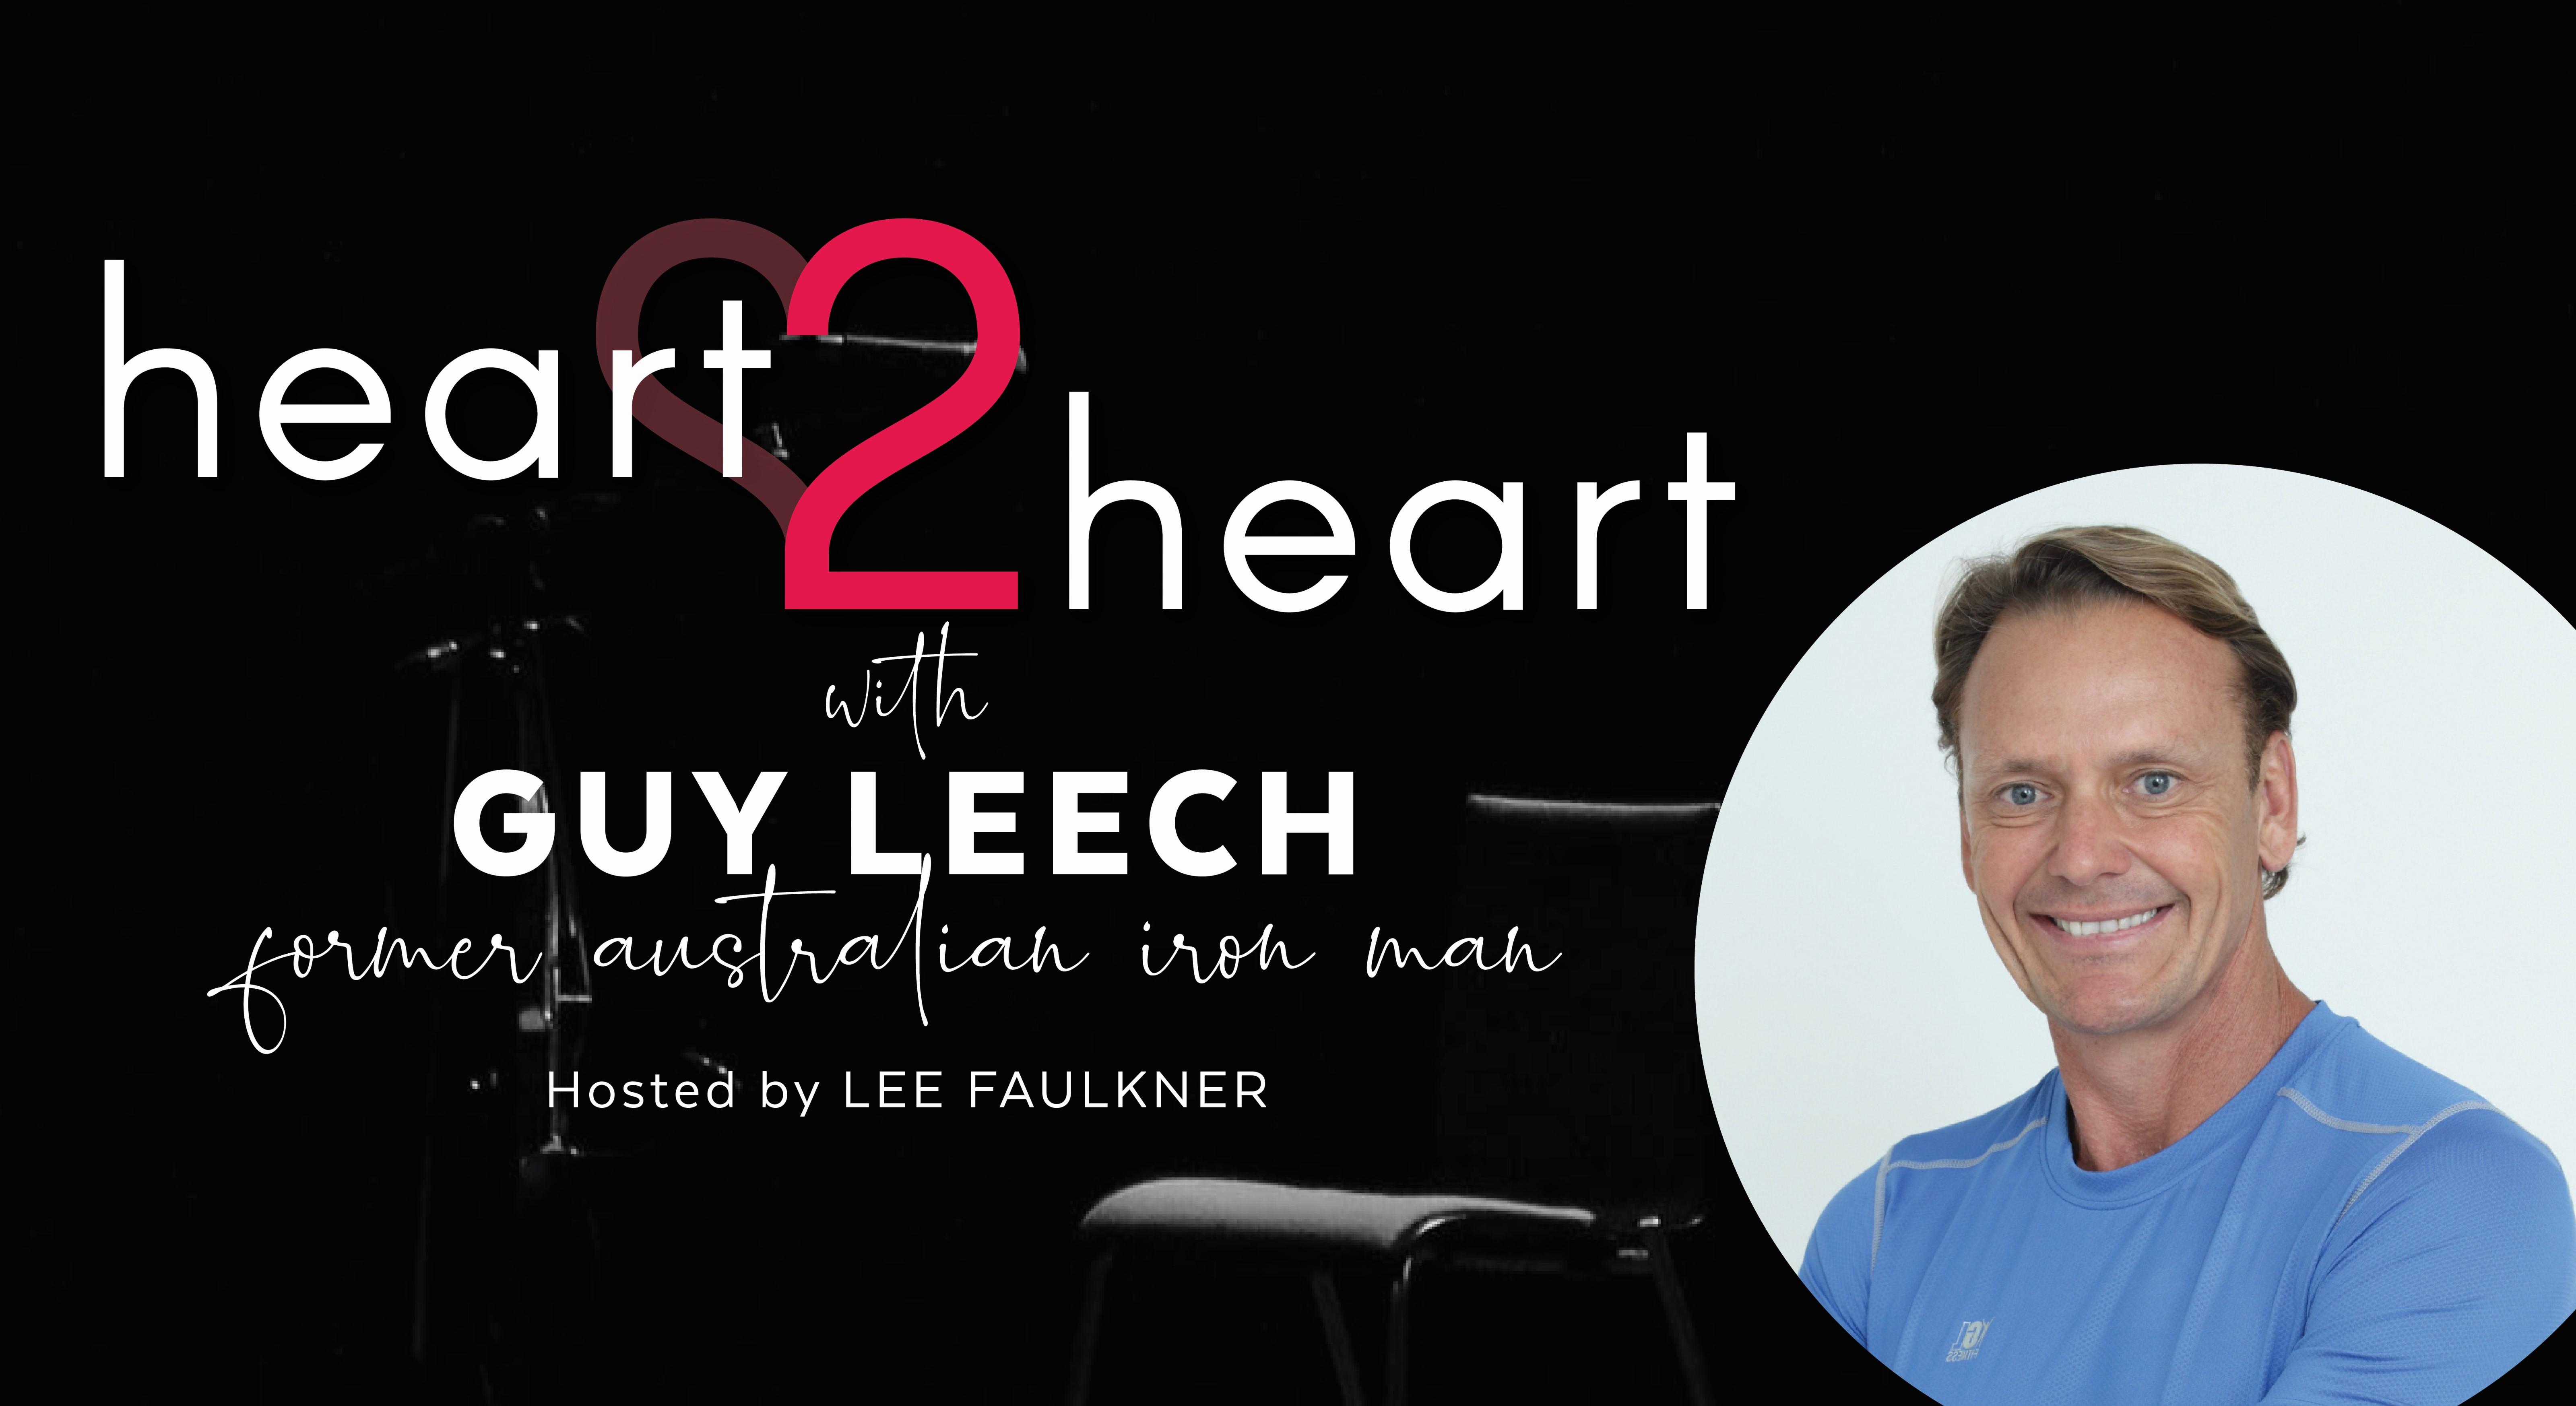 Heart 2 Heart with Guy Leech